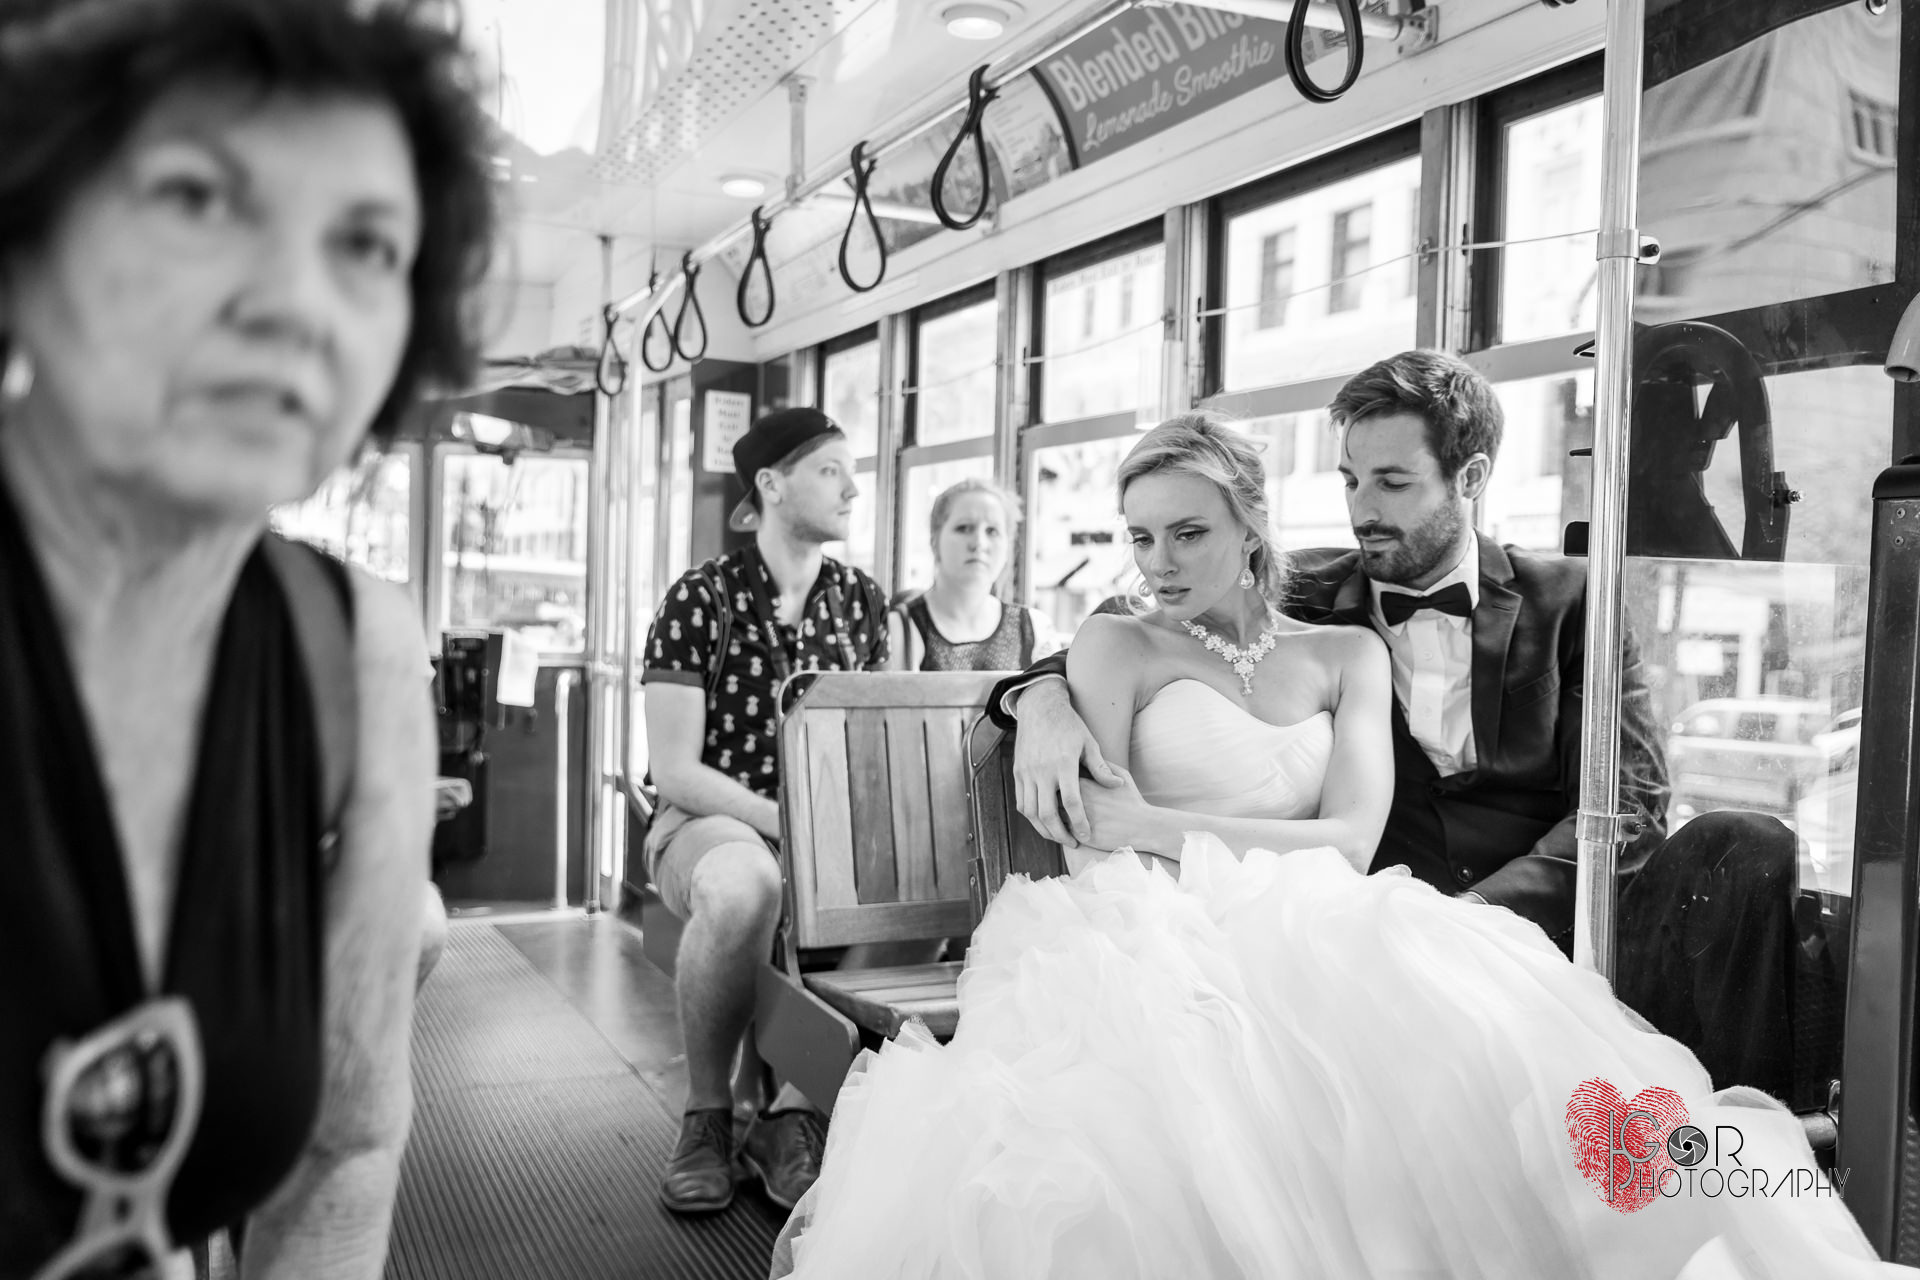 Candid wedding street photography